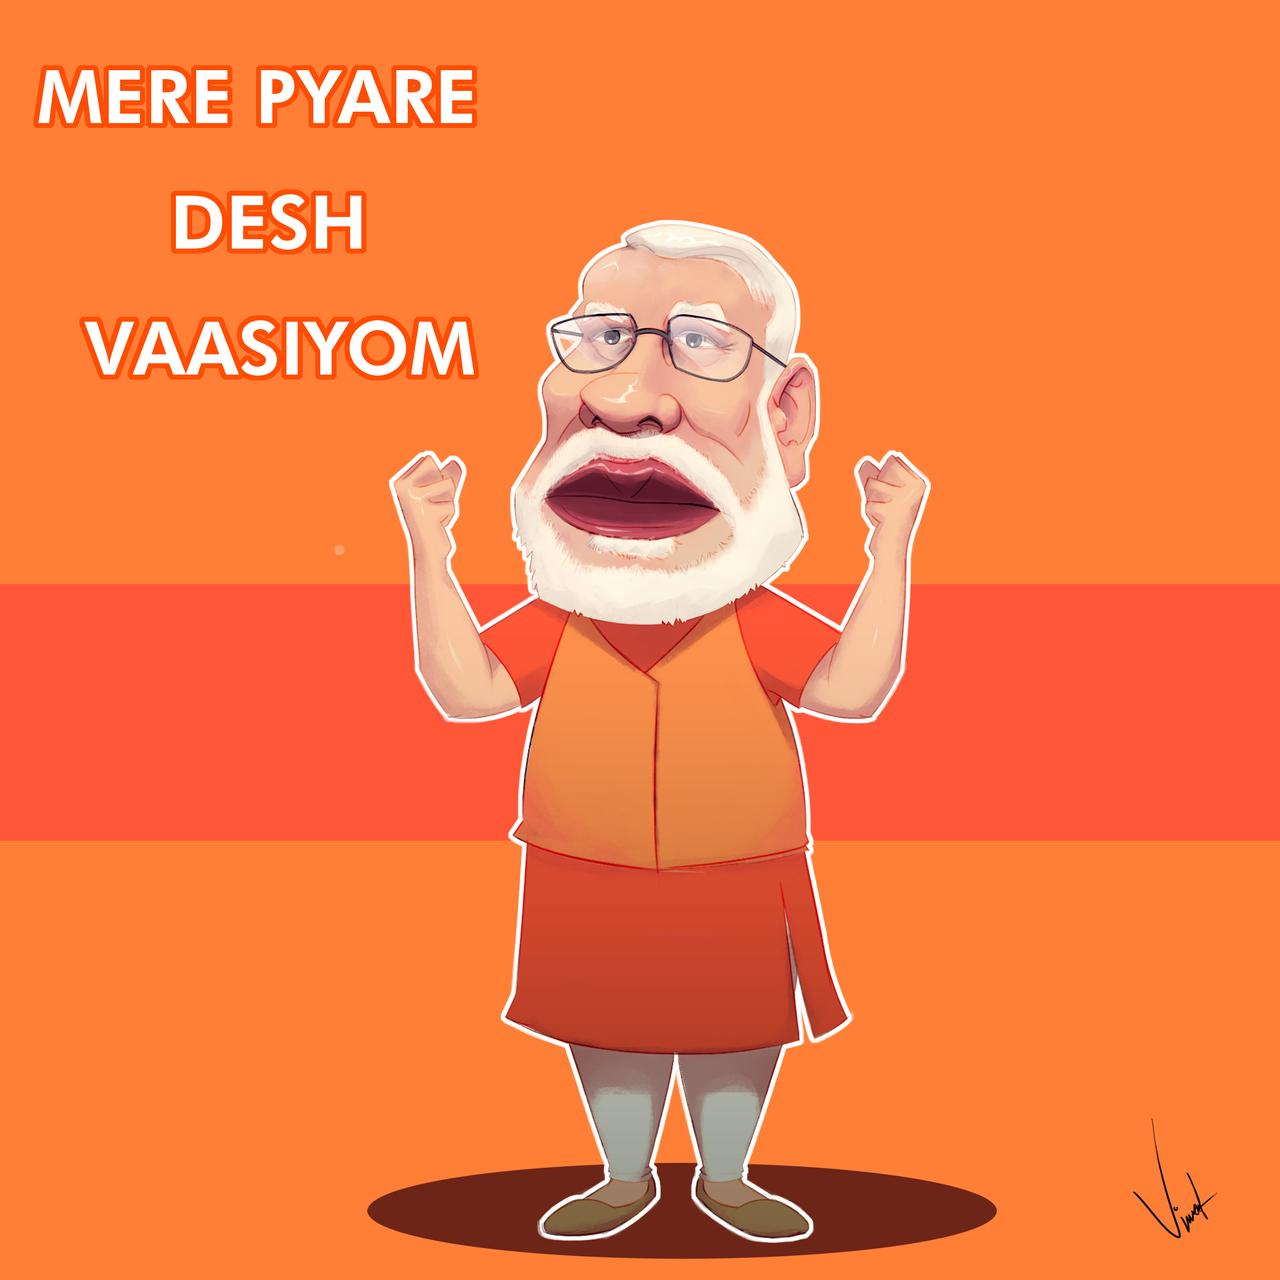 Indian prime minister Modi Caricature